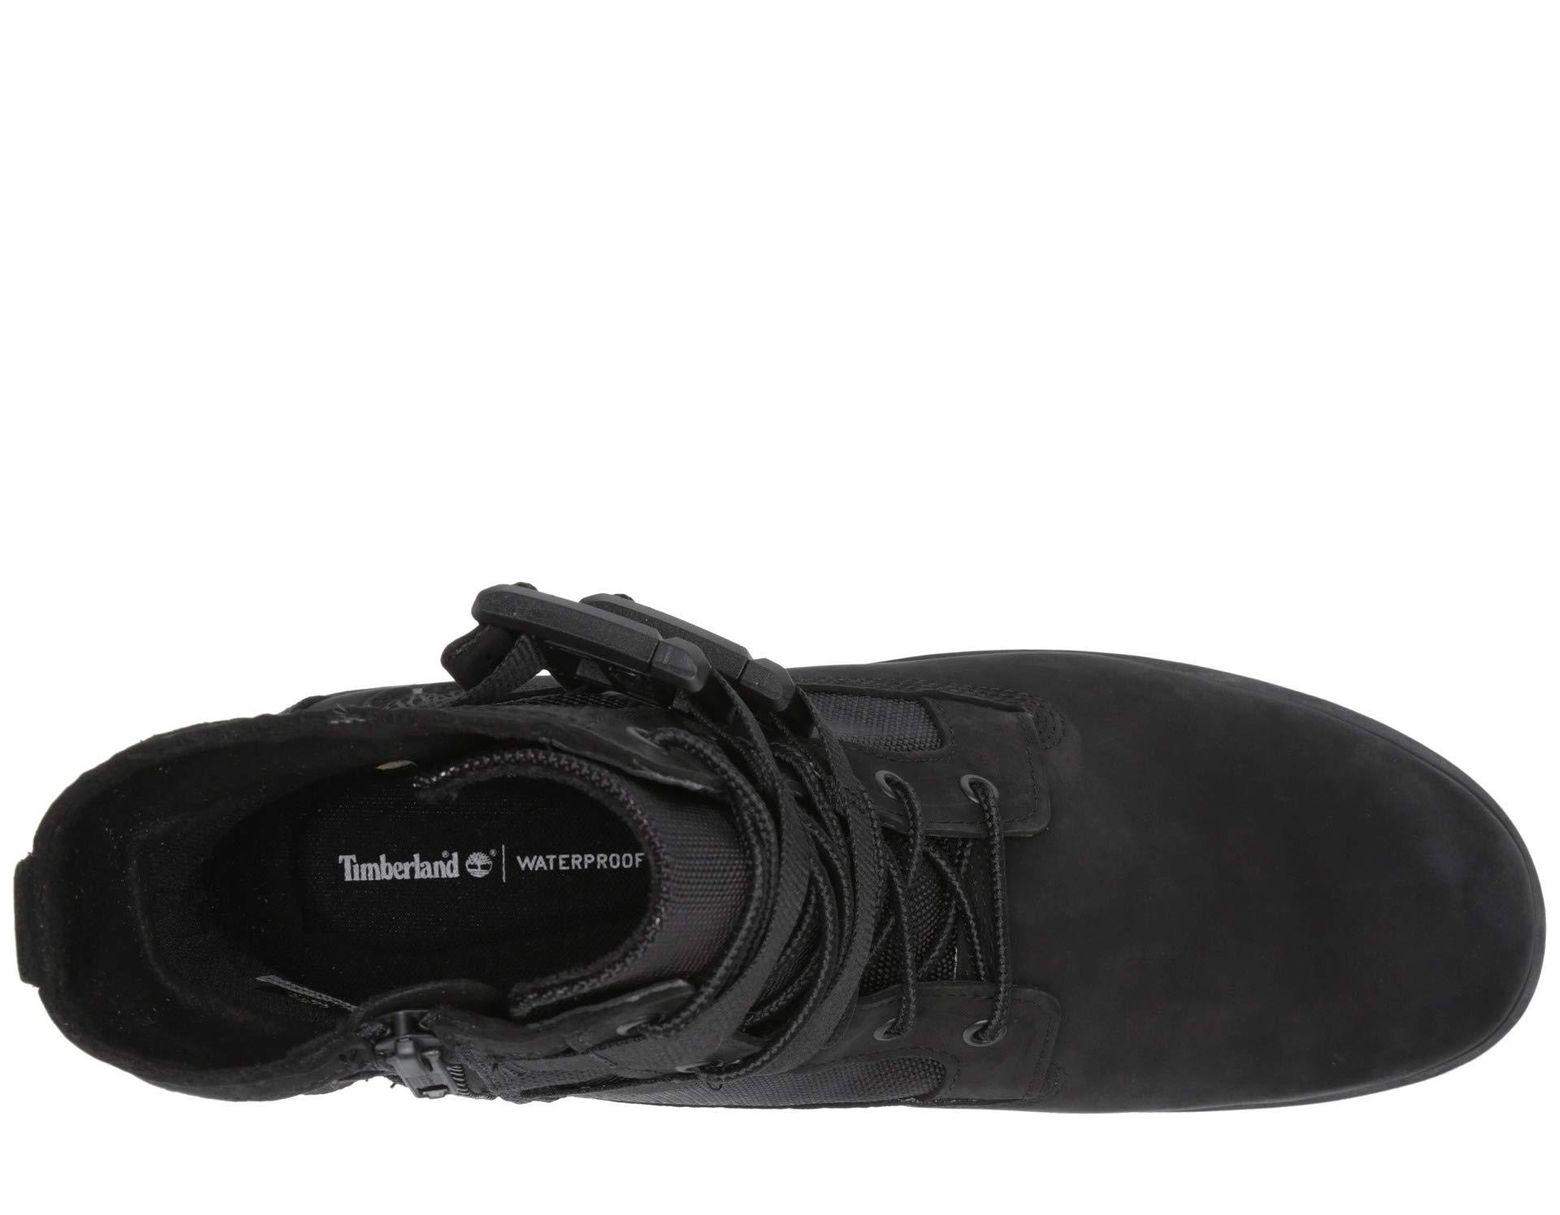 Timberland Jayne Double Buckle Waterproof Boot Women's Hiking